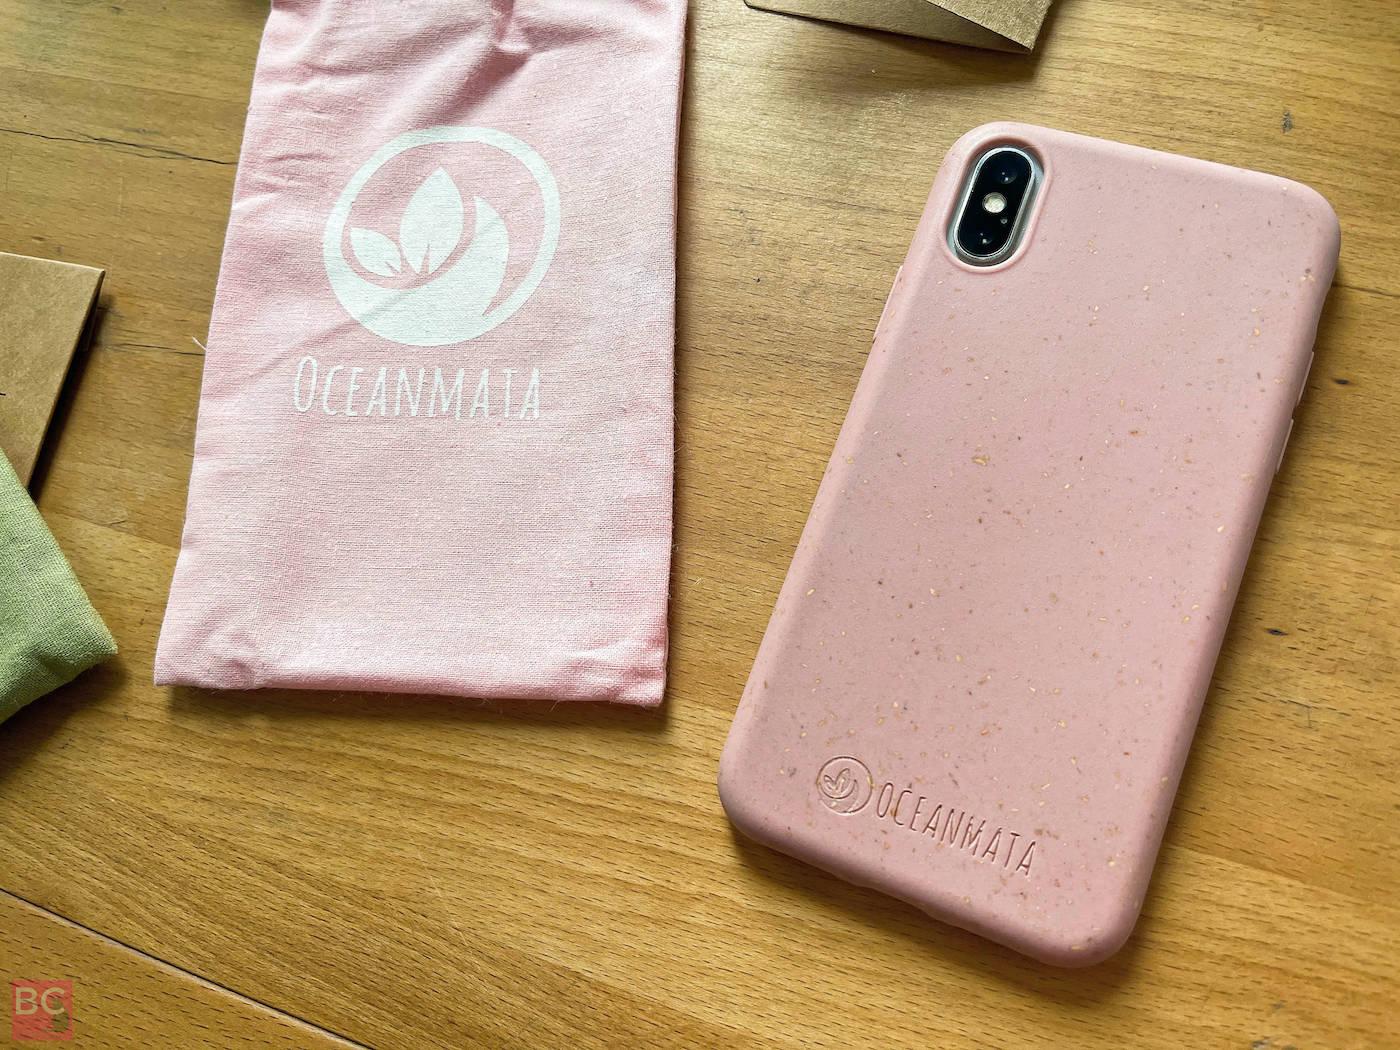 Stoffbeutel Etui OceanMata biologische iphone Hülle rosa Handyhülle ohne Plastik recycelt biologisch abbaubar hinten